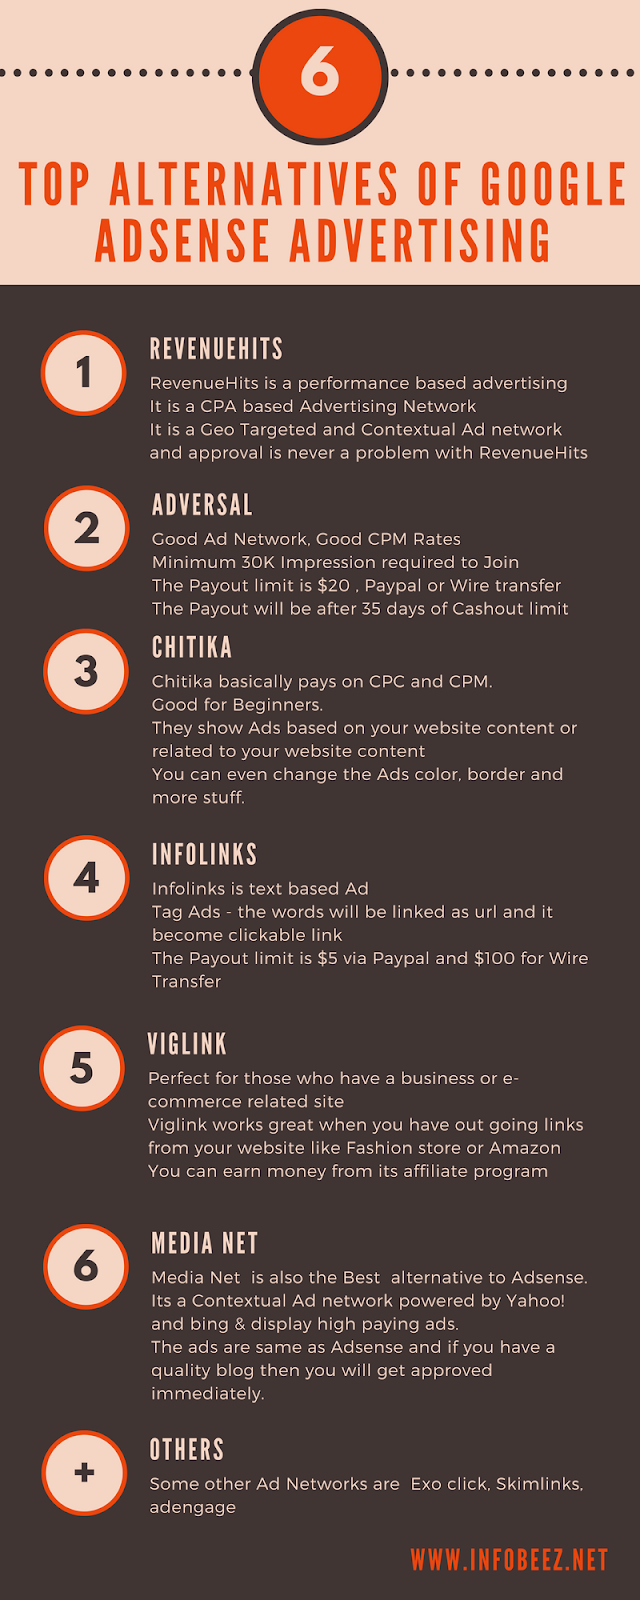 6 Top Alternatives Of Google Adsense Advertising Info Beez